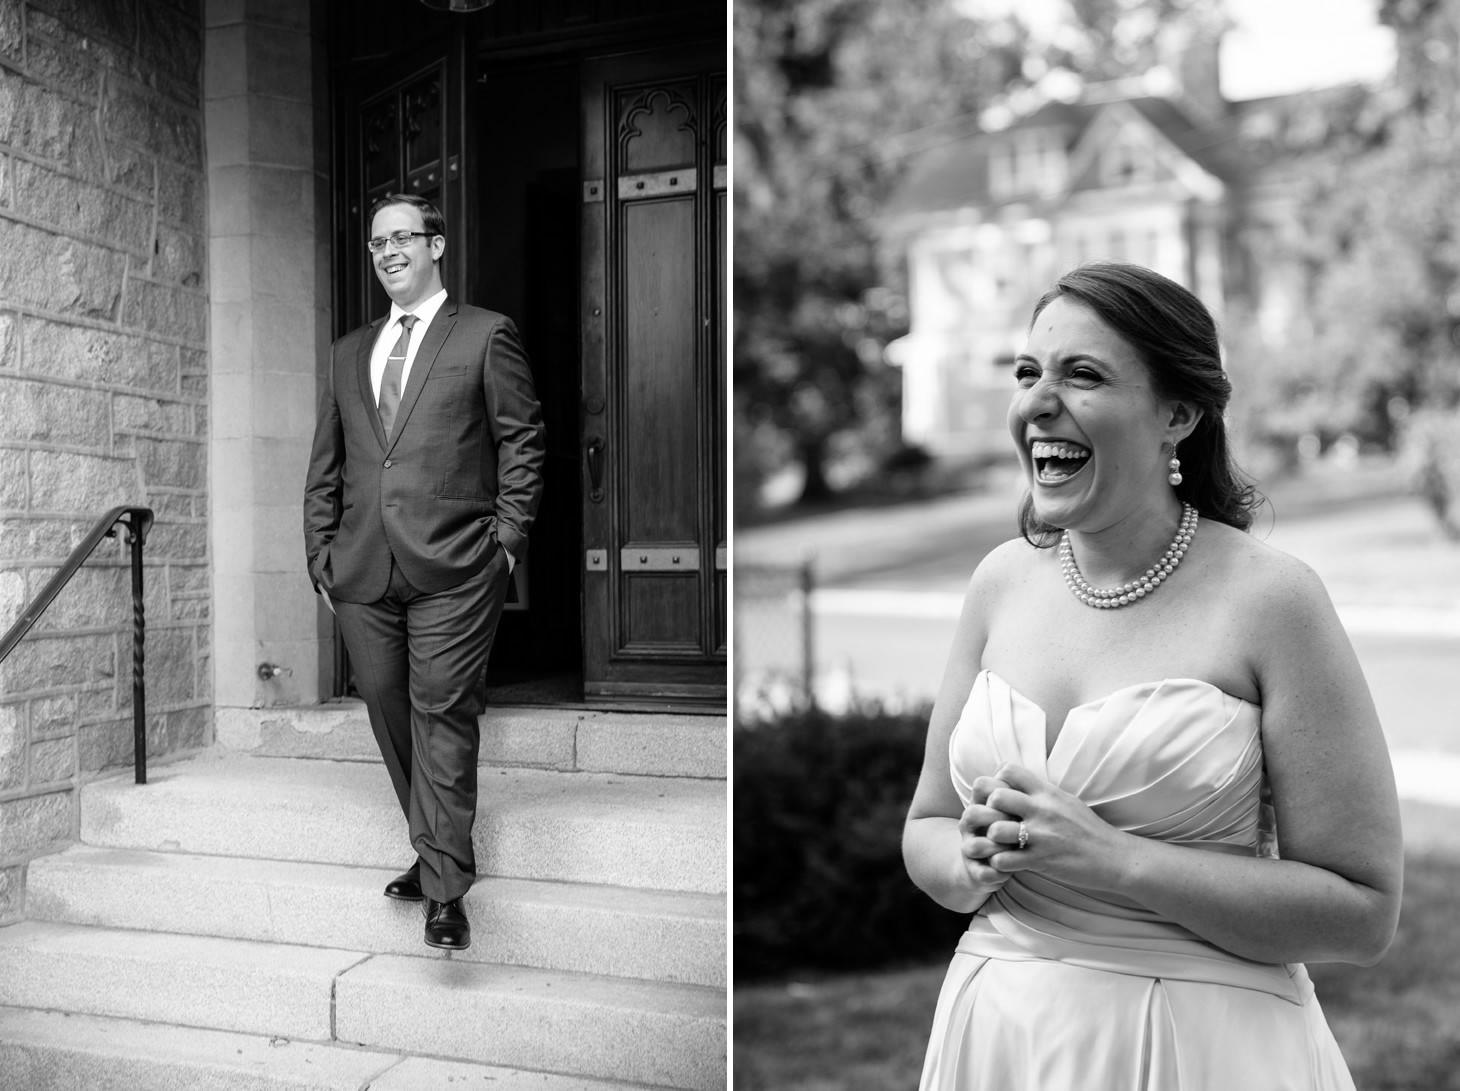 004-nyc-wedding-photographer-hoboken-waterfront-wedding-photos-smitten-chickens.jpg